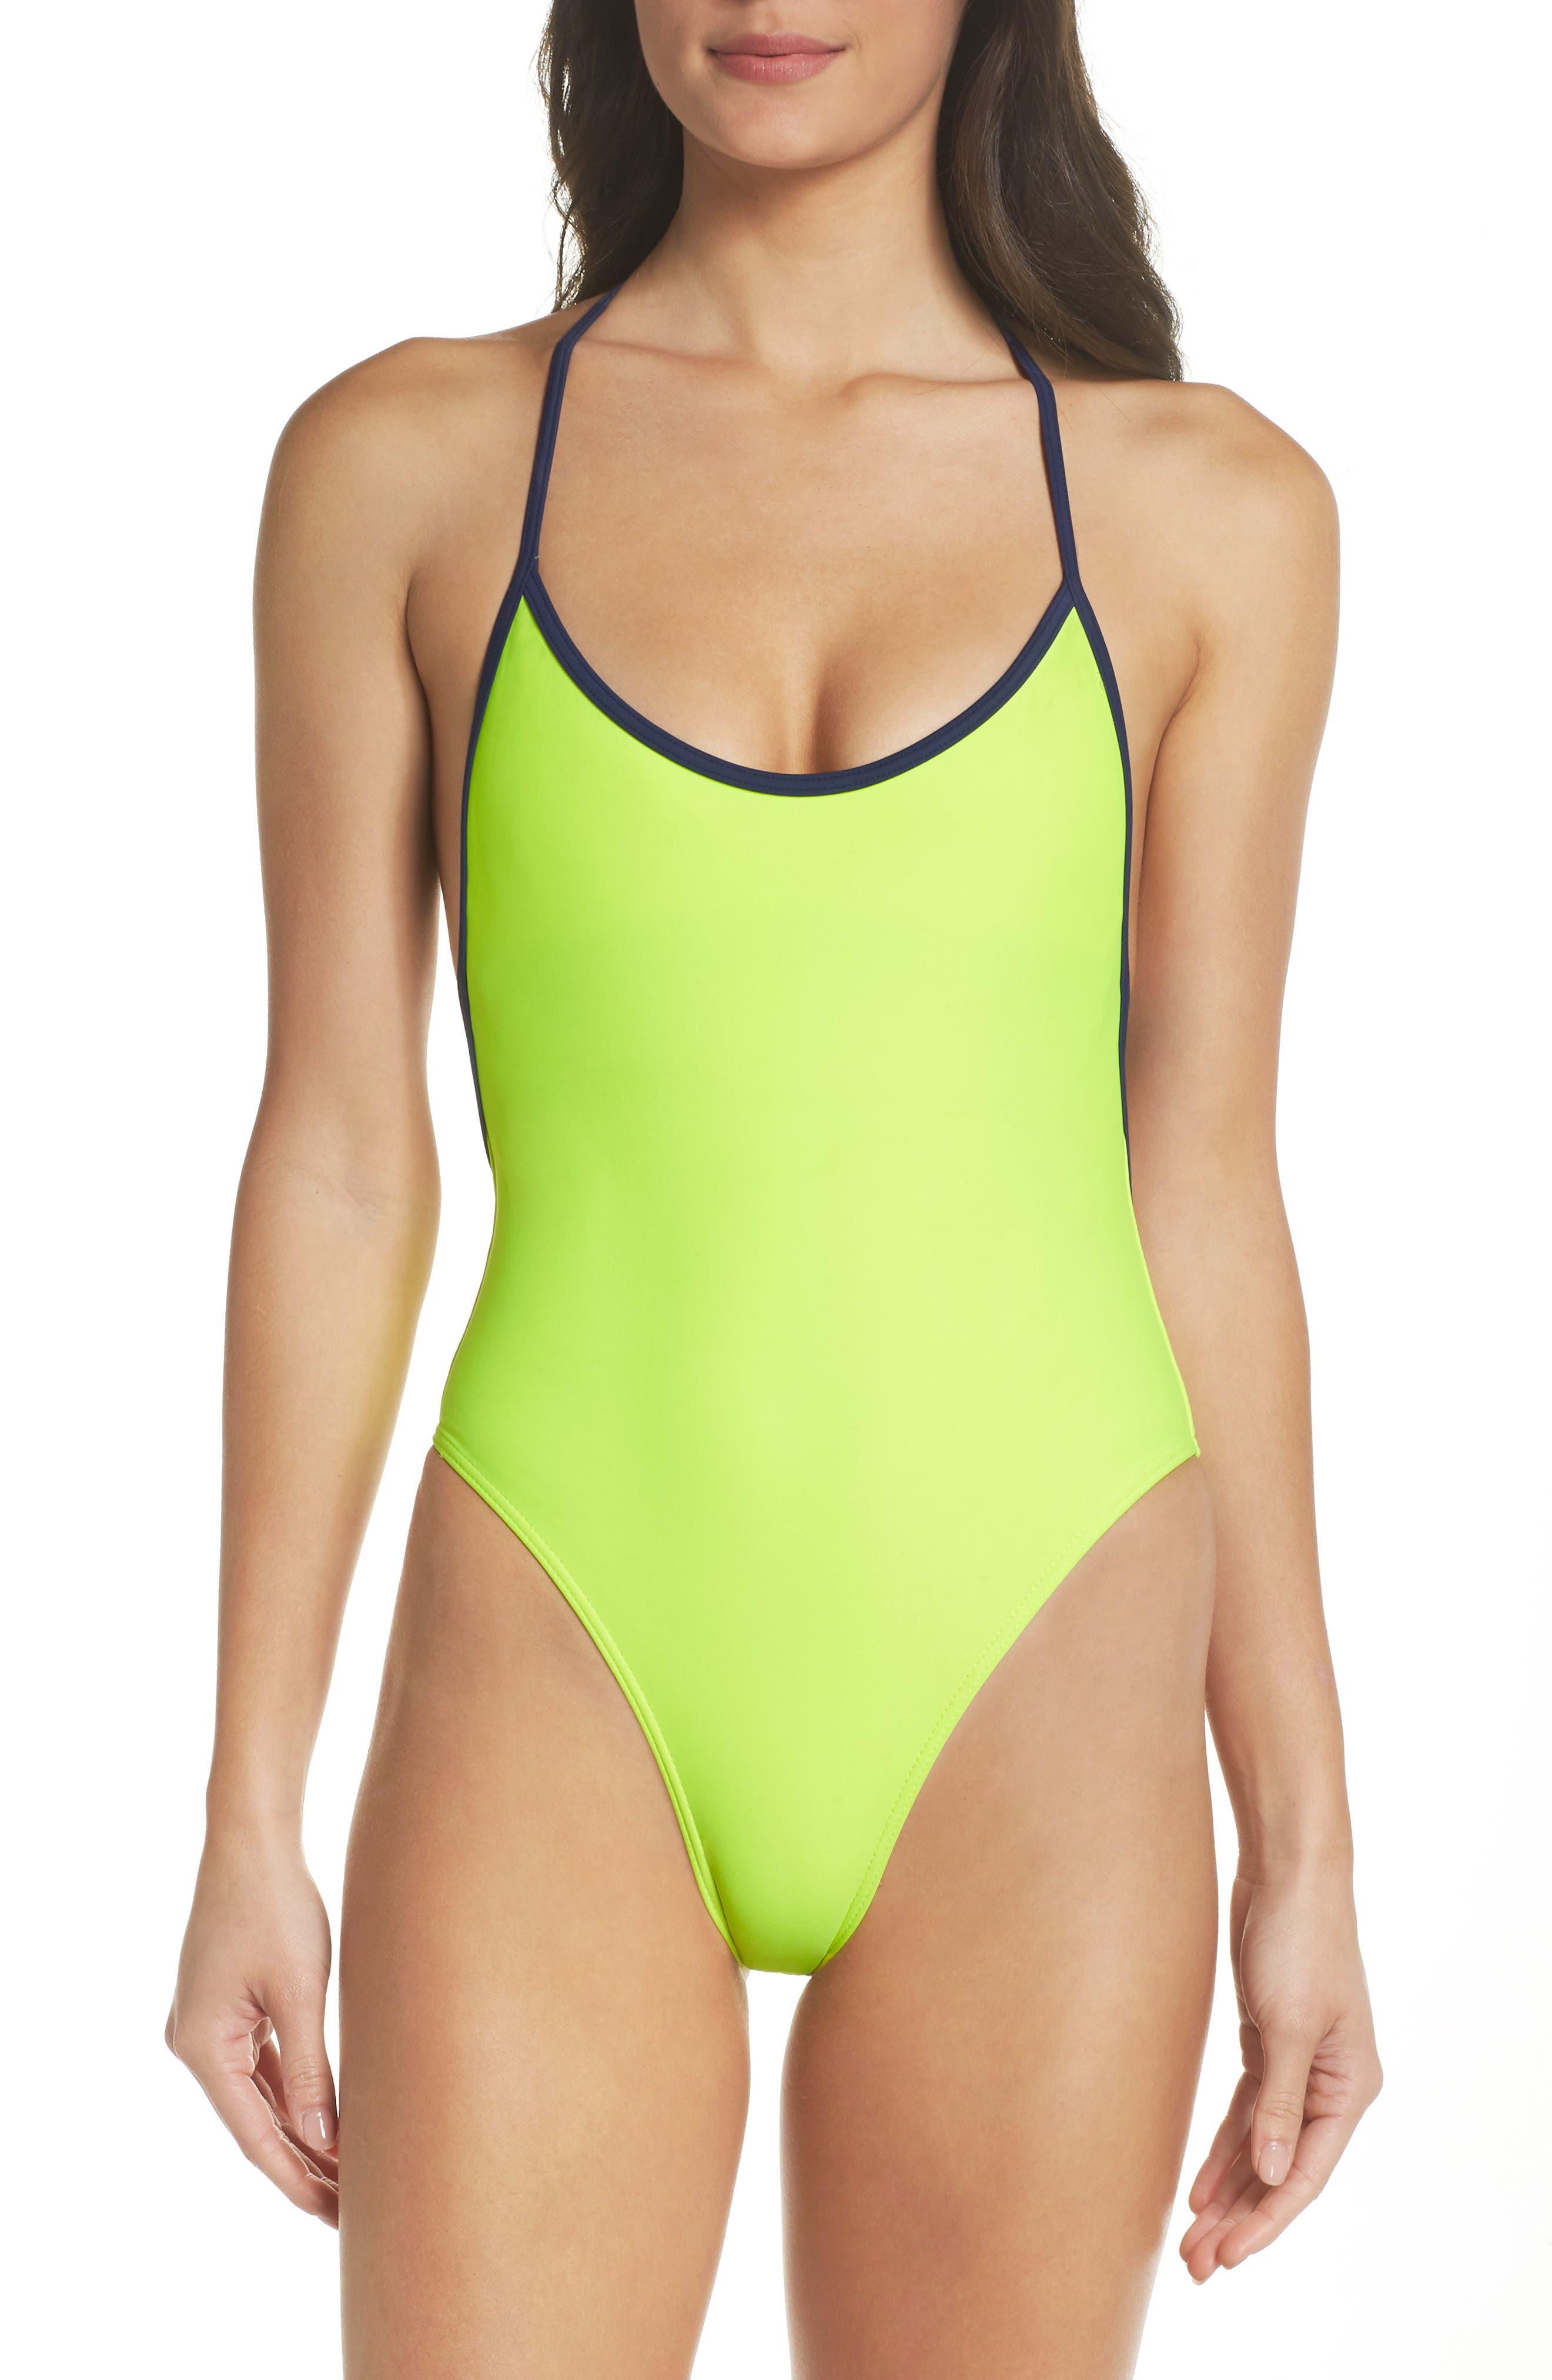 Alternate Image 1 Selected - Chromat T-Suit One-Piece Swimsuit